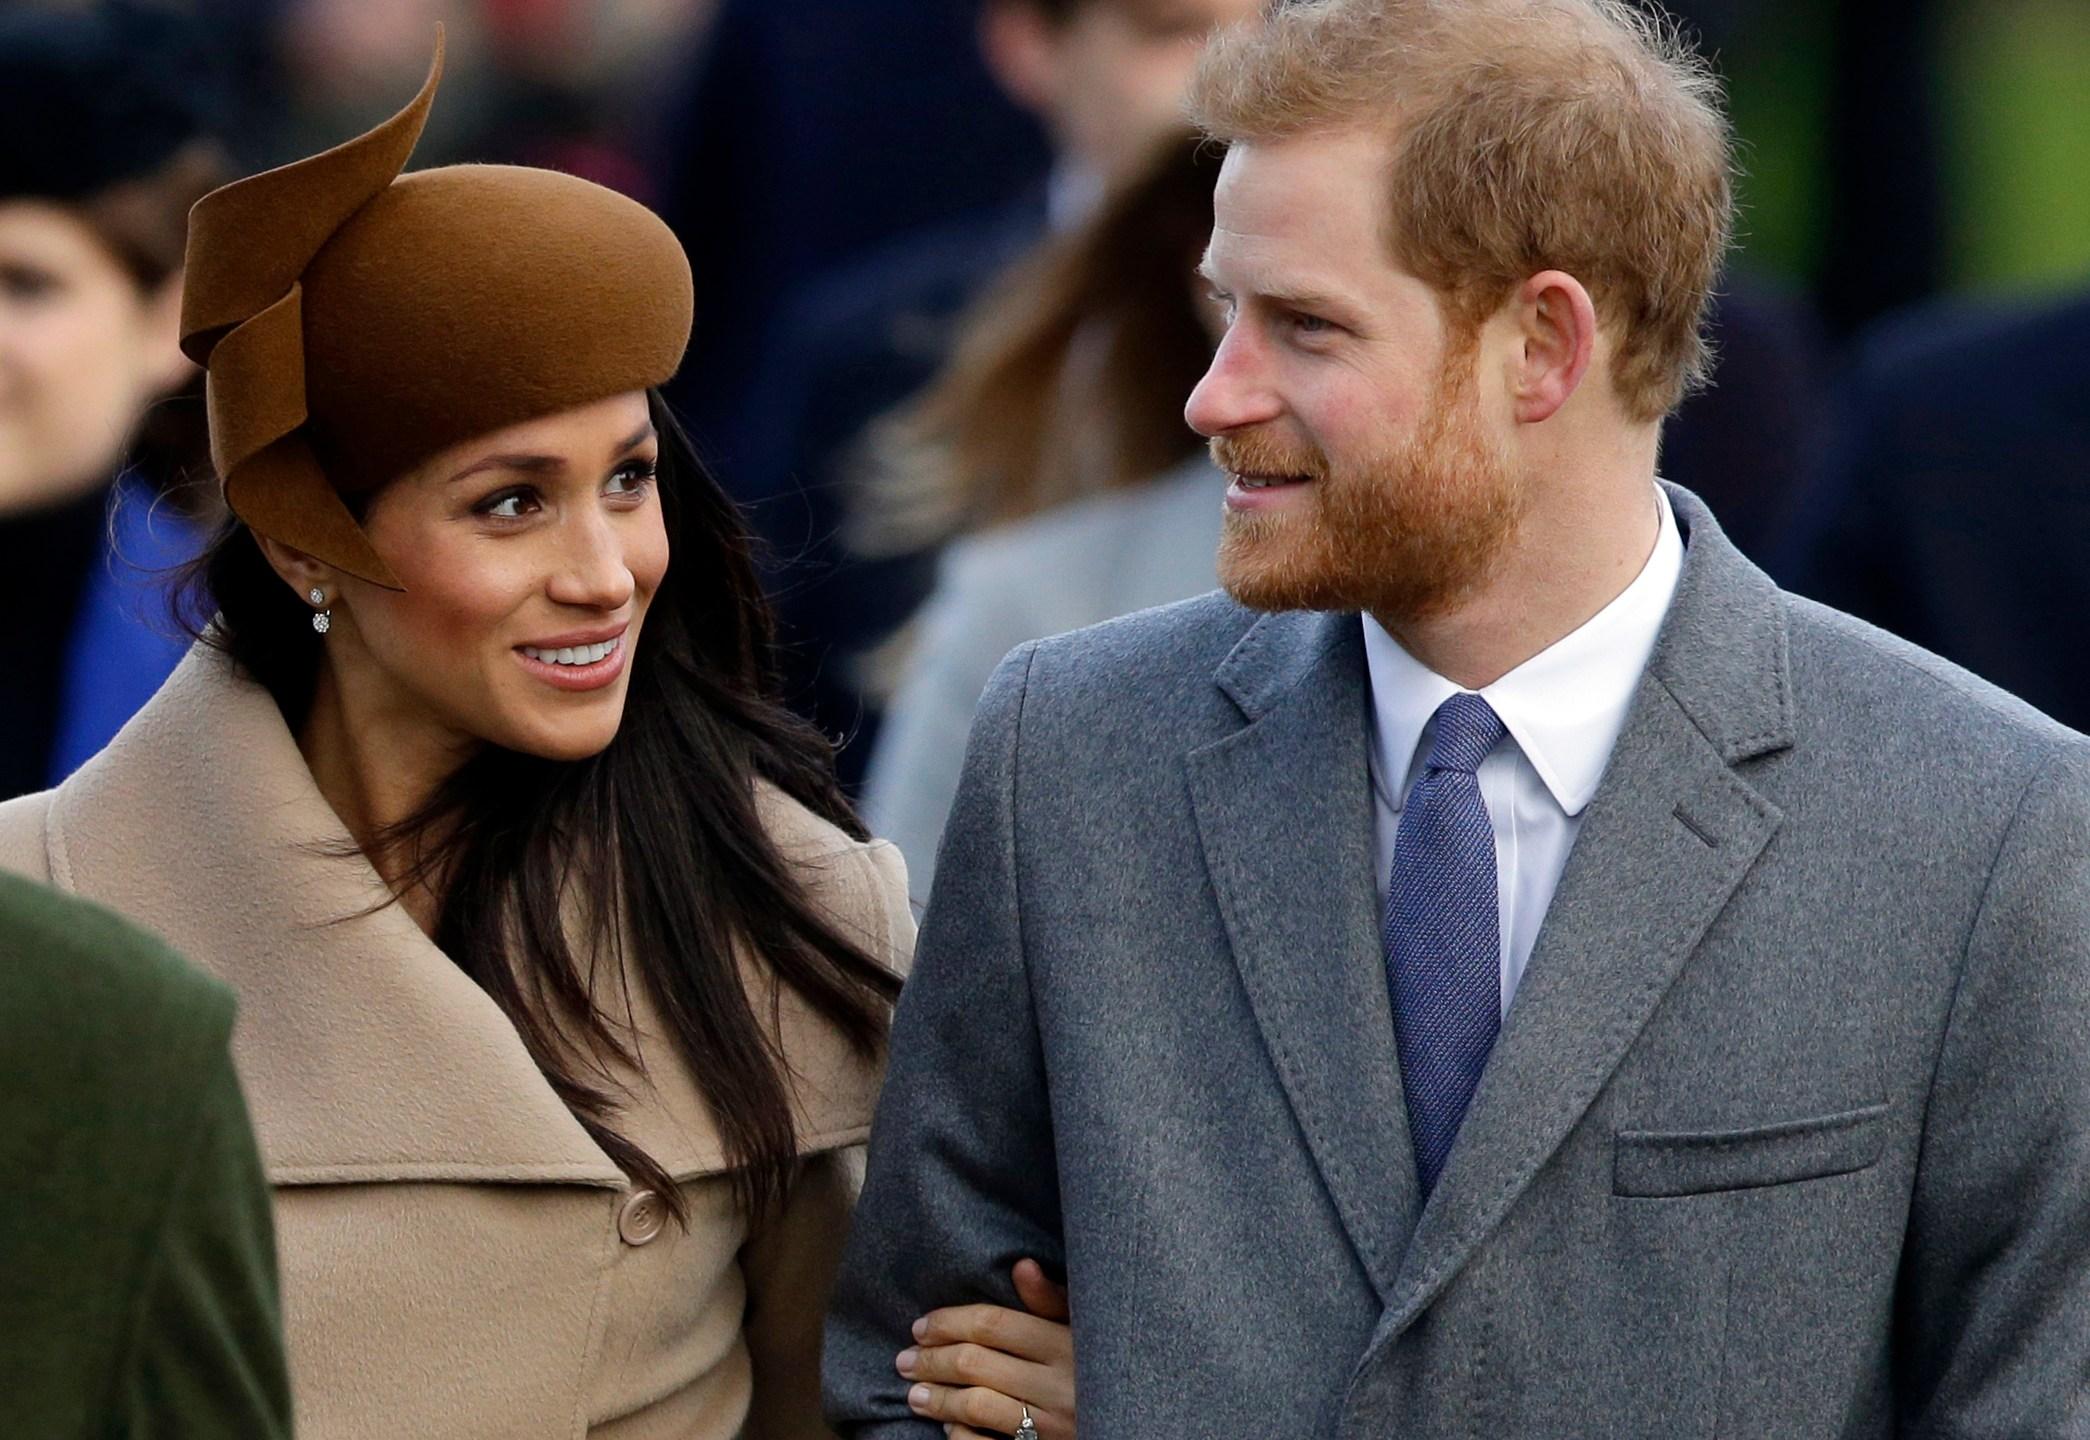 Britain_Royal_Wedding_99357-159532.jpg55919864